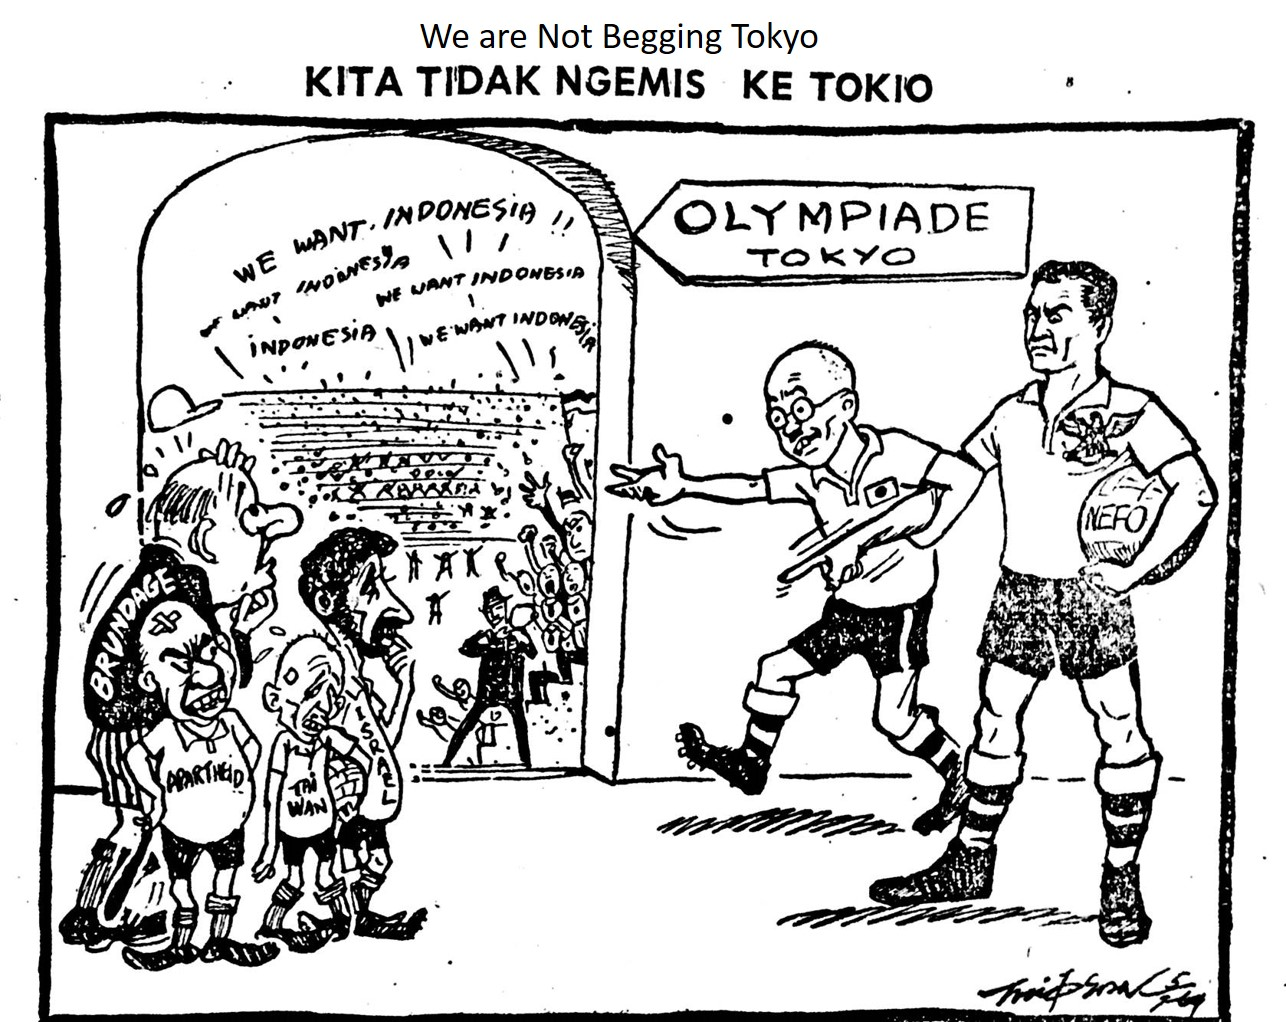 Boycotts Olympiad